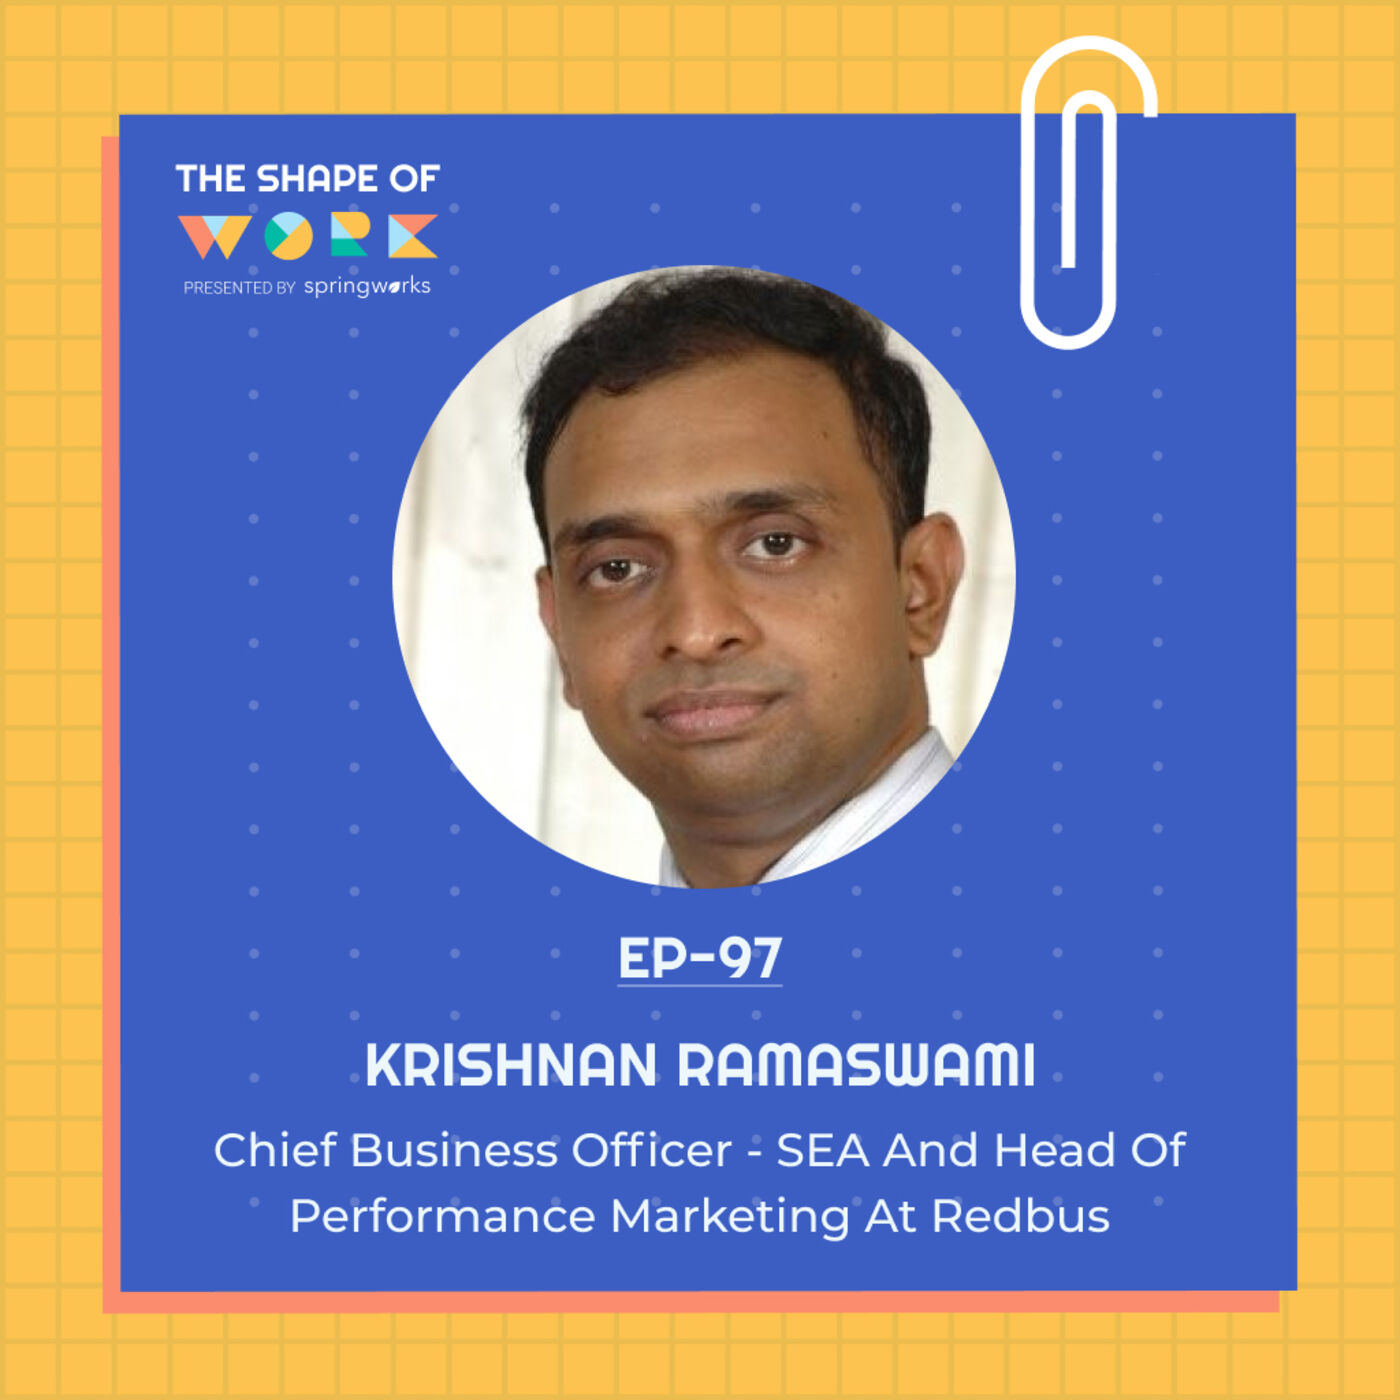 #97: Krishnan Ramaswami on managing a global team, employee feedback loops, employer branding and more